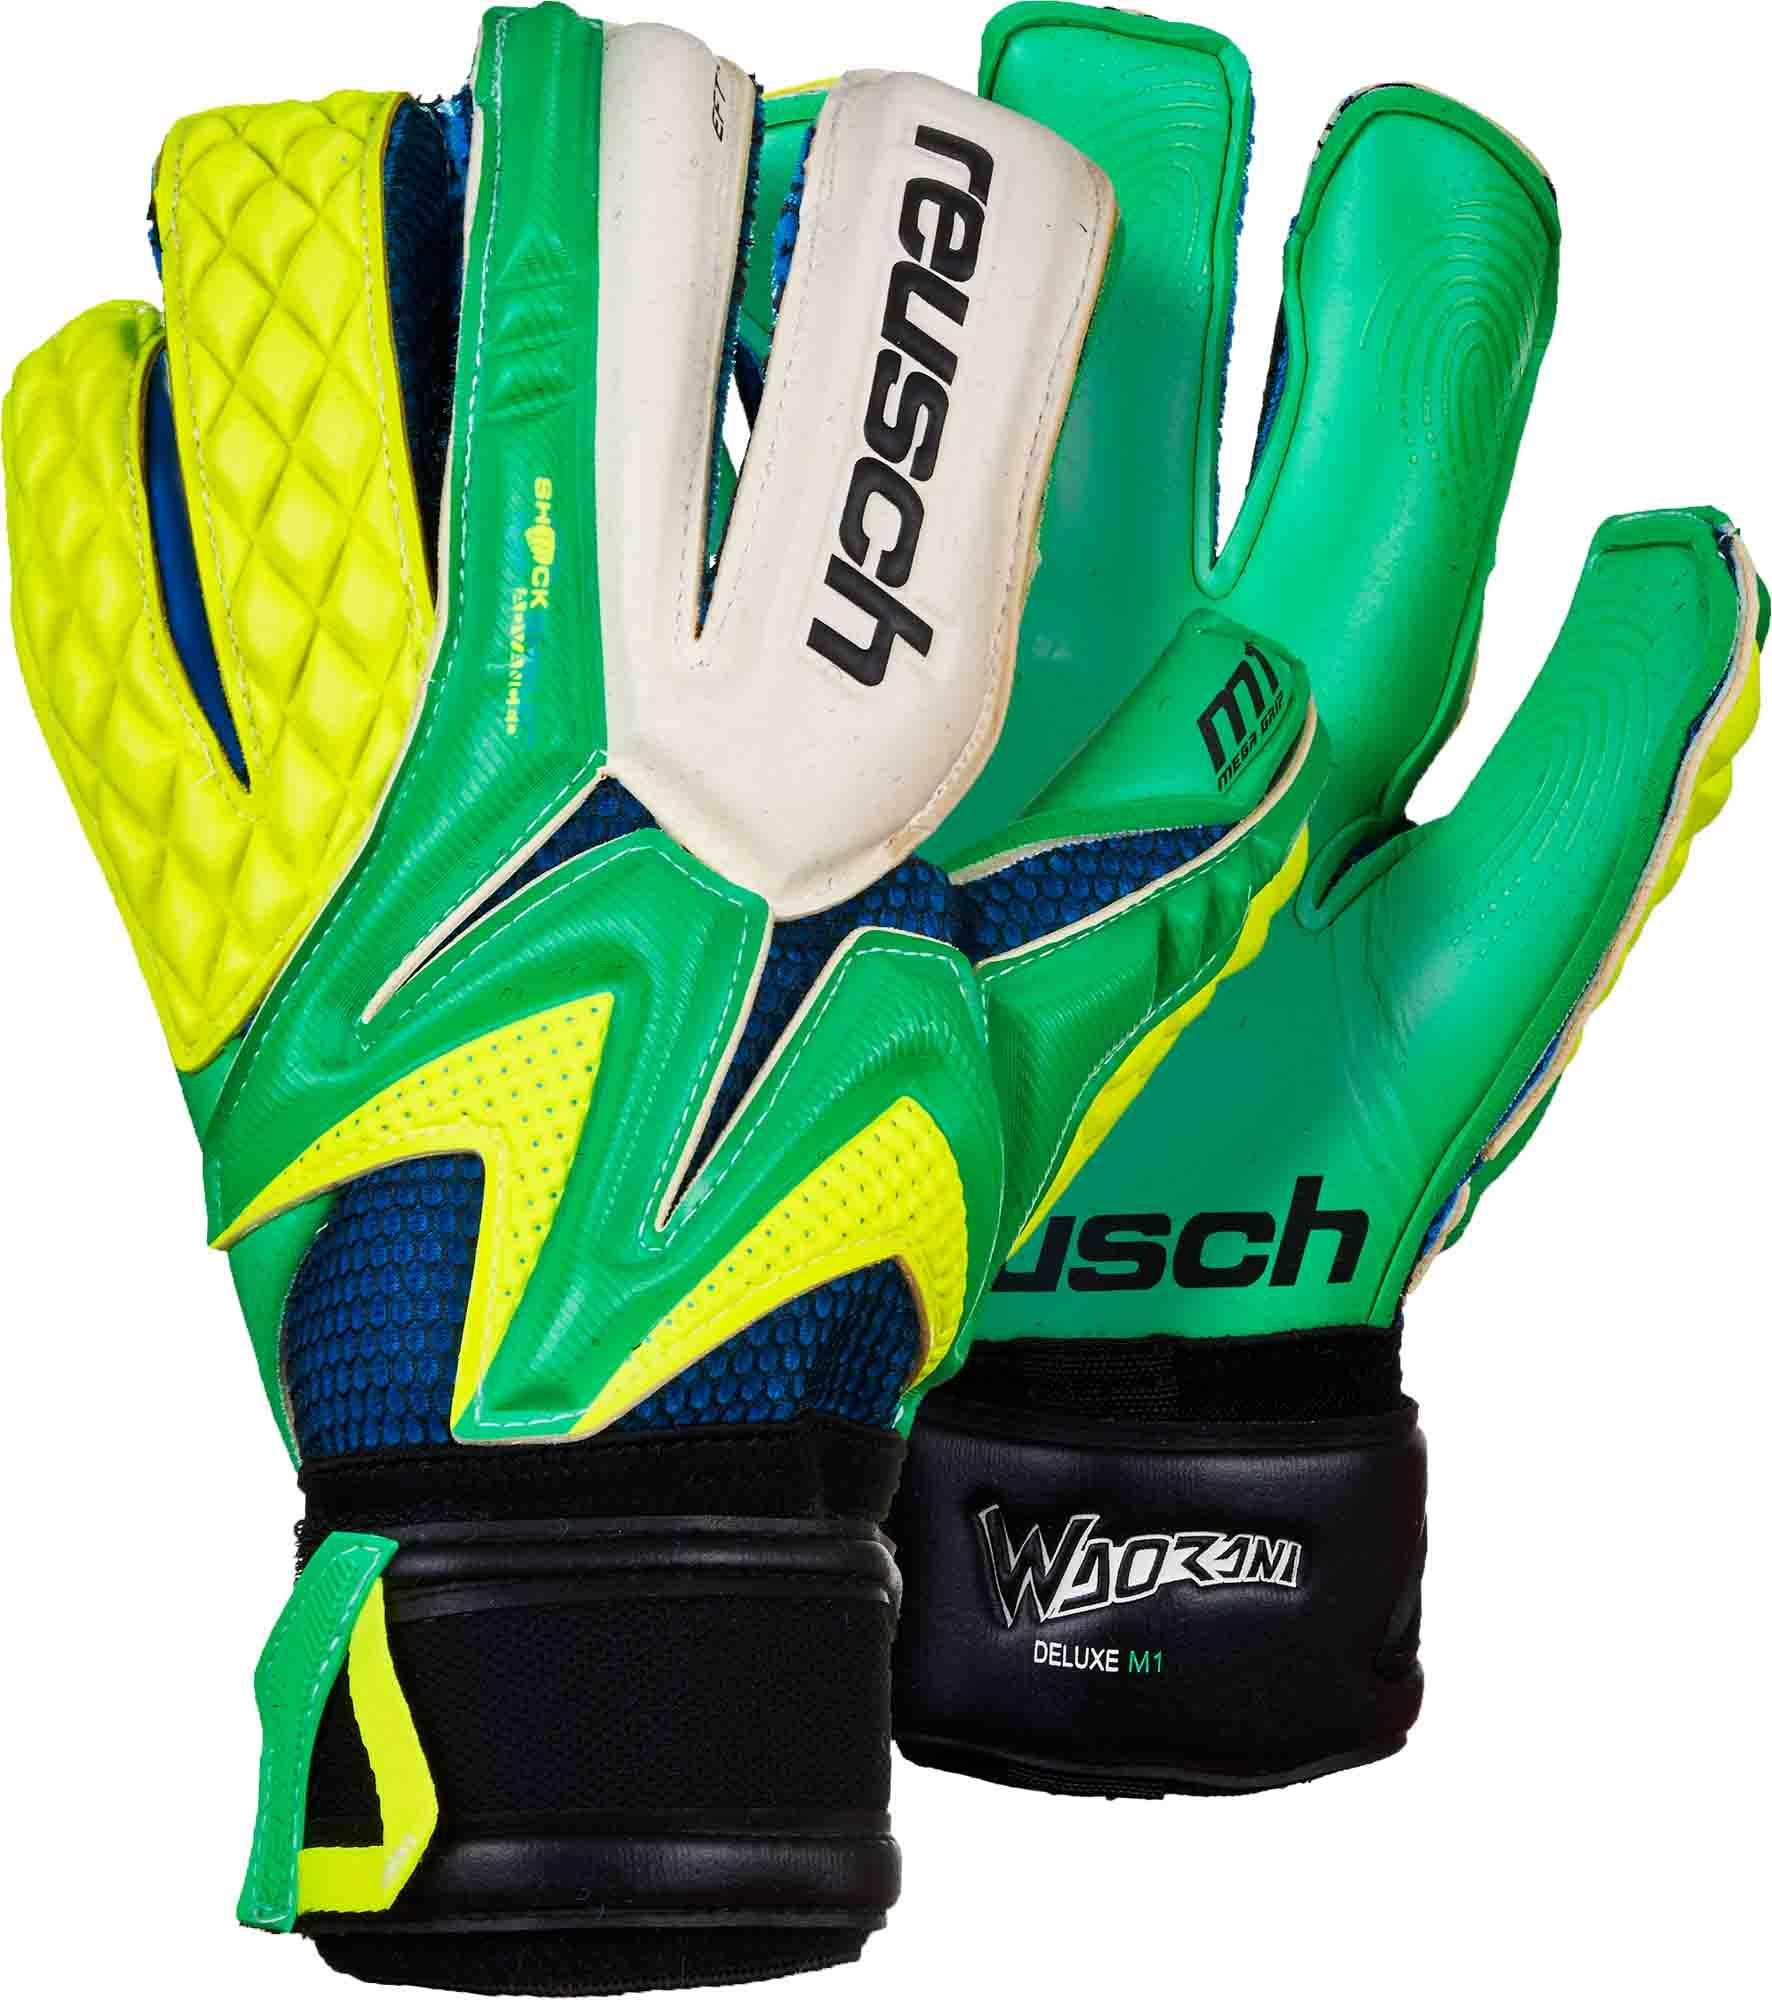 Reusch Waorani Deluxe M1 Goalkeeper Gloves Irish Green with Yellow ... 6107035a6